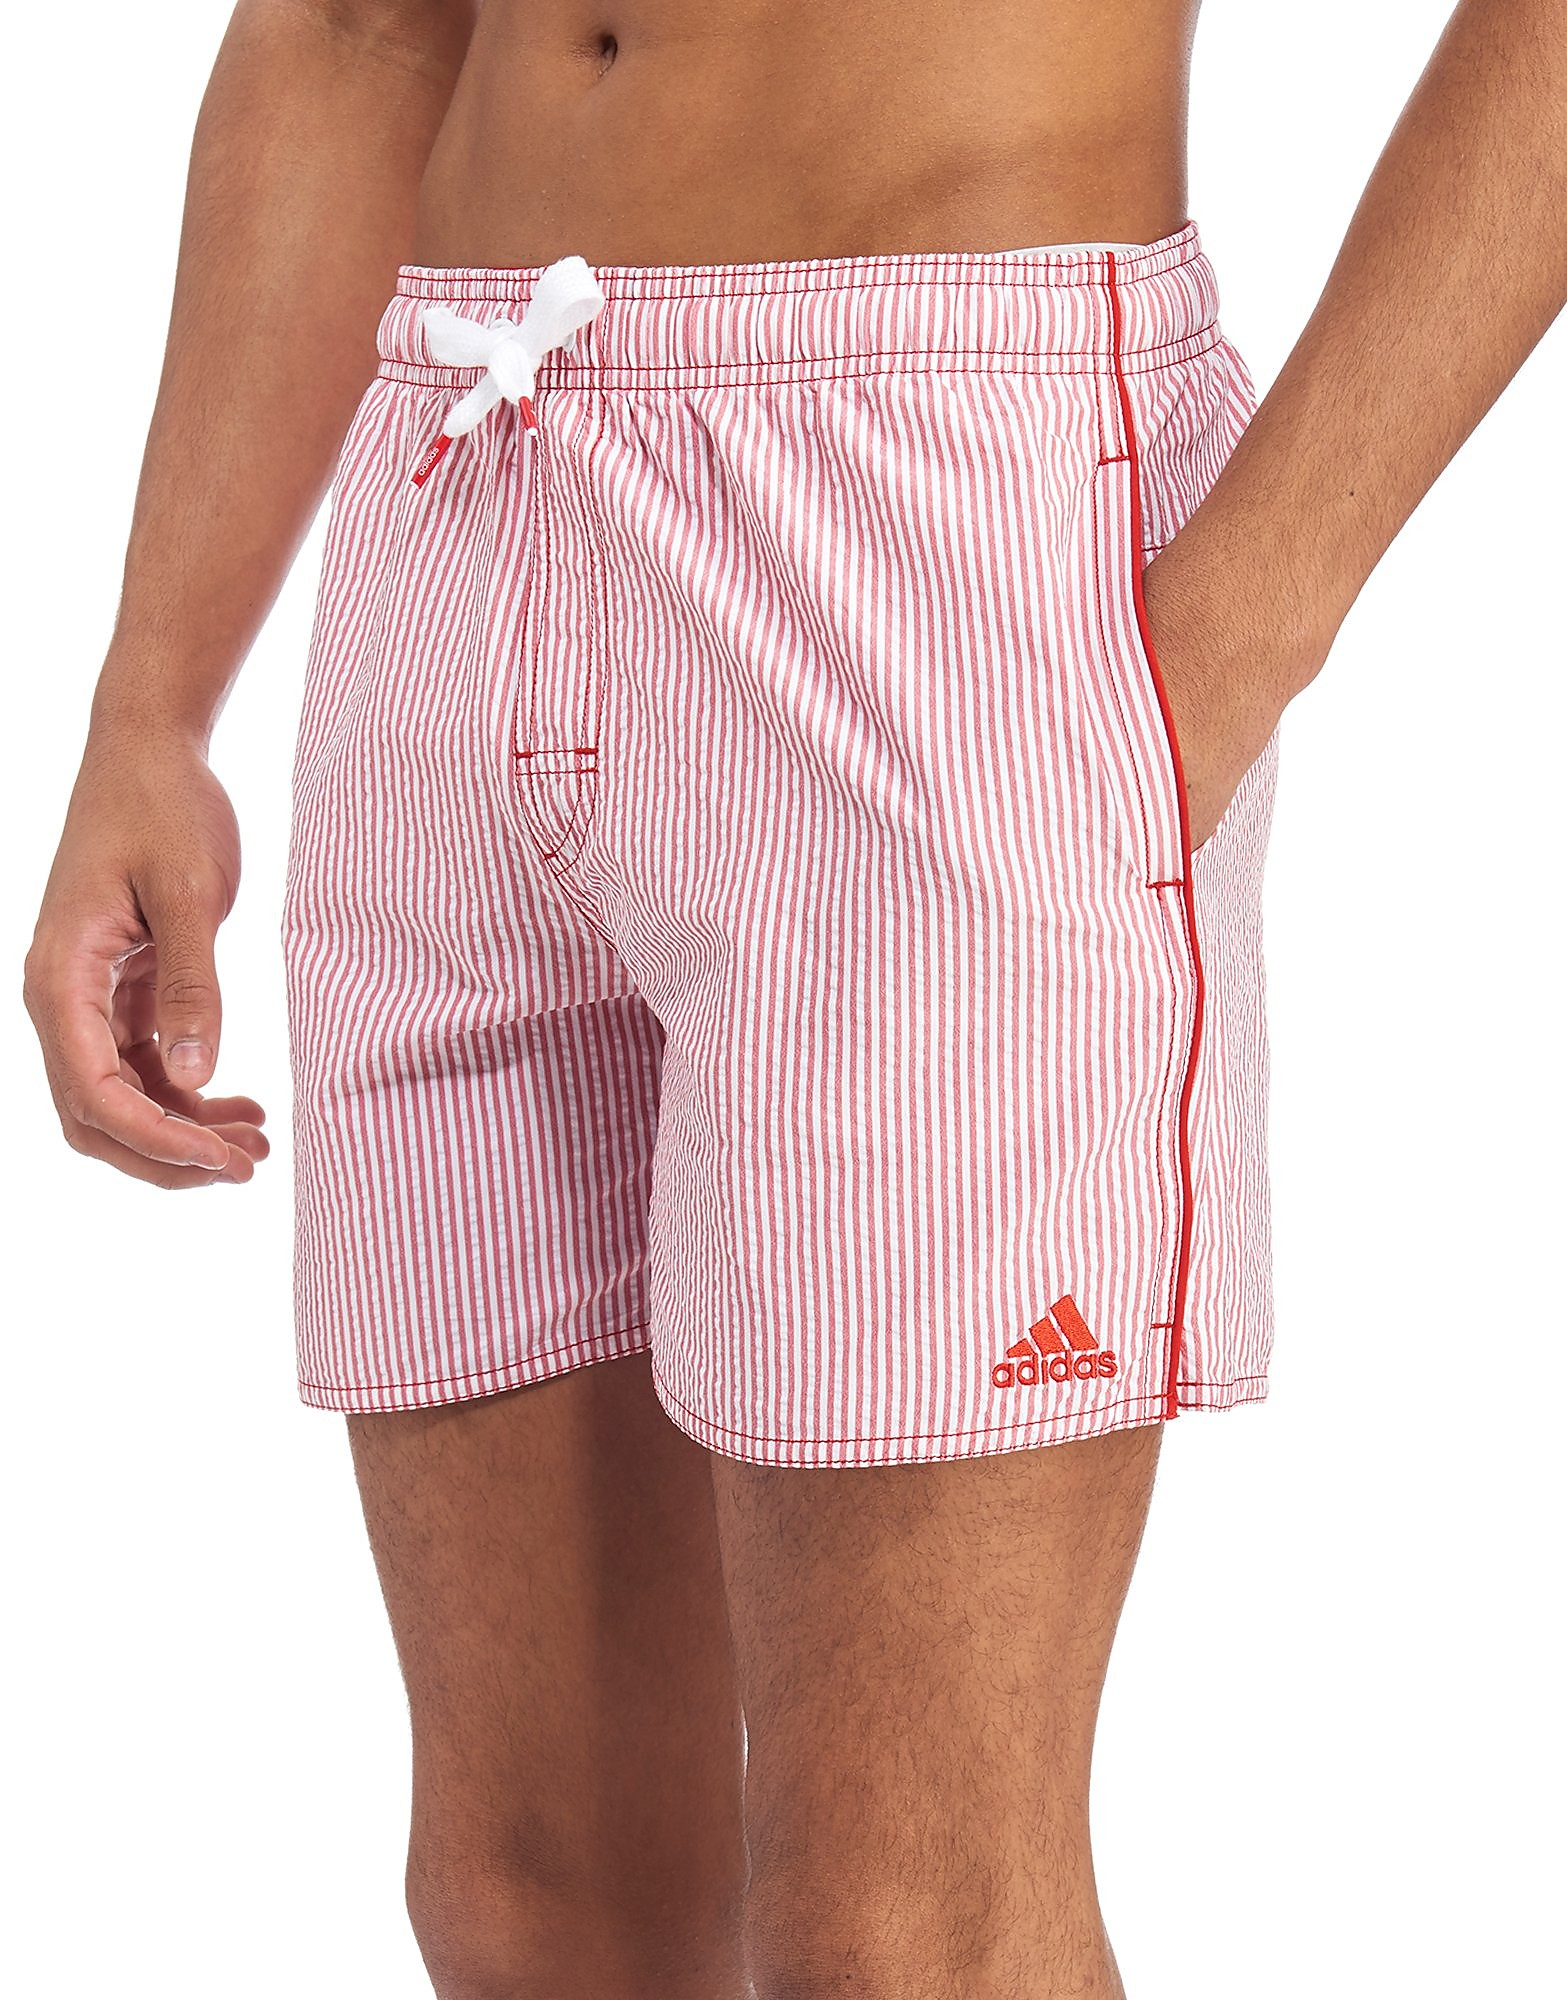 c96439afb4 adidas Stripe Swim Shorts - Scarlet/ White - Mens - Sports King Store